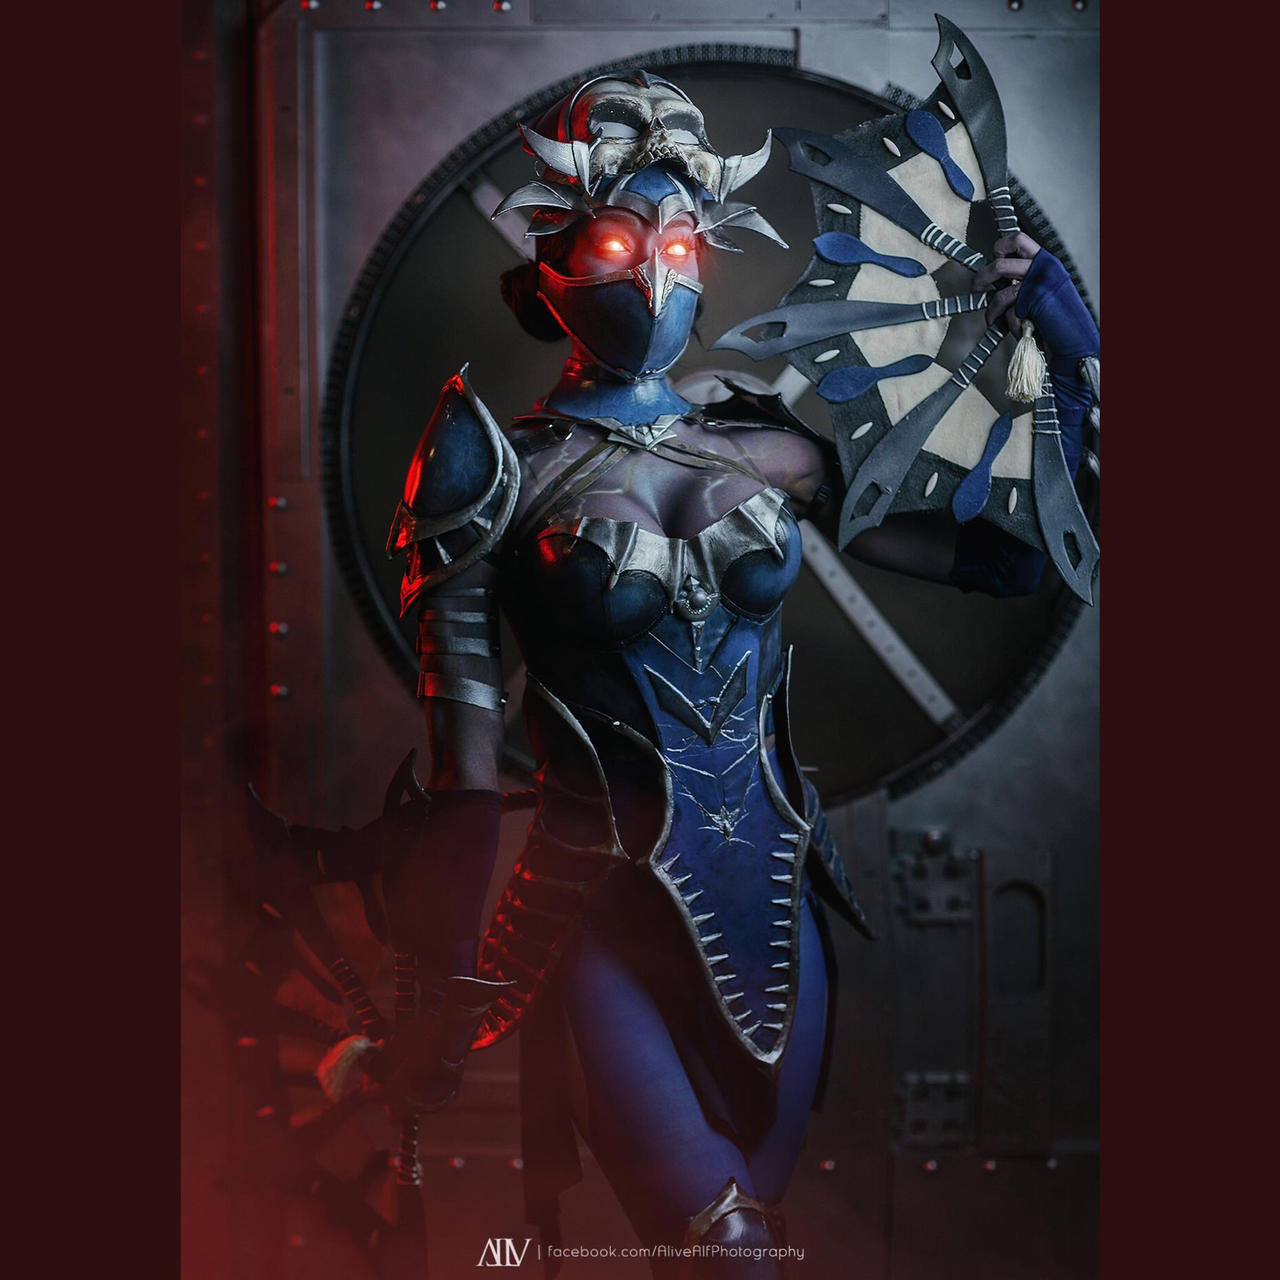 Kitana Cosplay Mortal Kombat 11 By Aliciamariebody On Deviantart